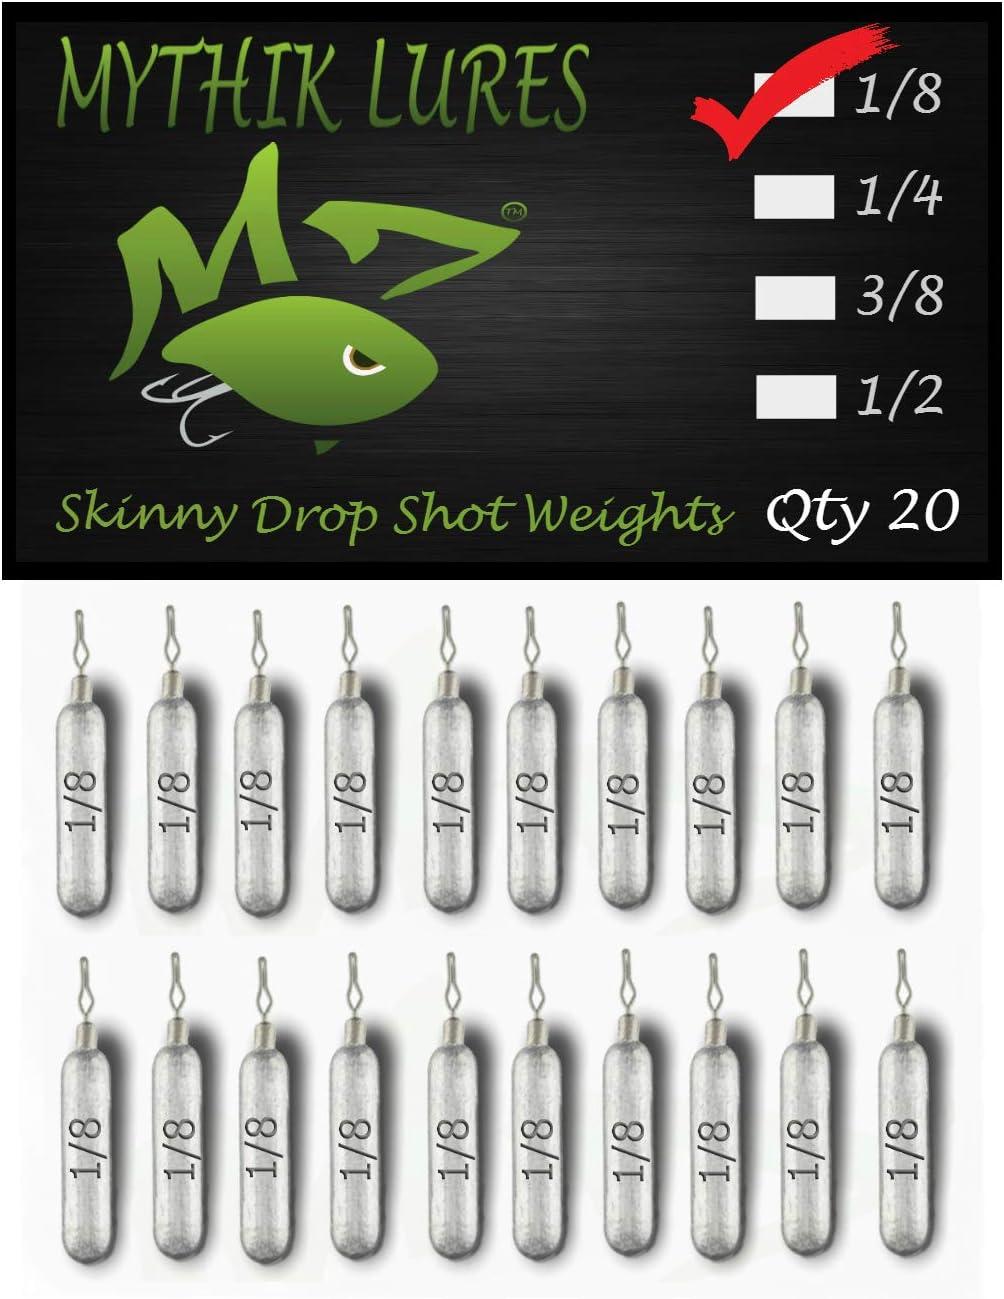 10g Raindrop Shape Fishing Sinkers Lead Weights Fishing Accessories for Drop//Bottom Fishing Bullet Streamlined Shape Lead Drop Shot Weights for Fishing AEIOUS 50Pcs Fishing Weights Sinkers